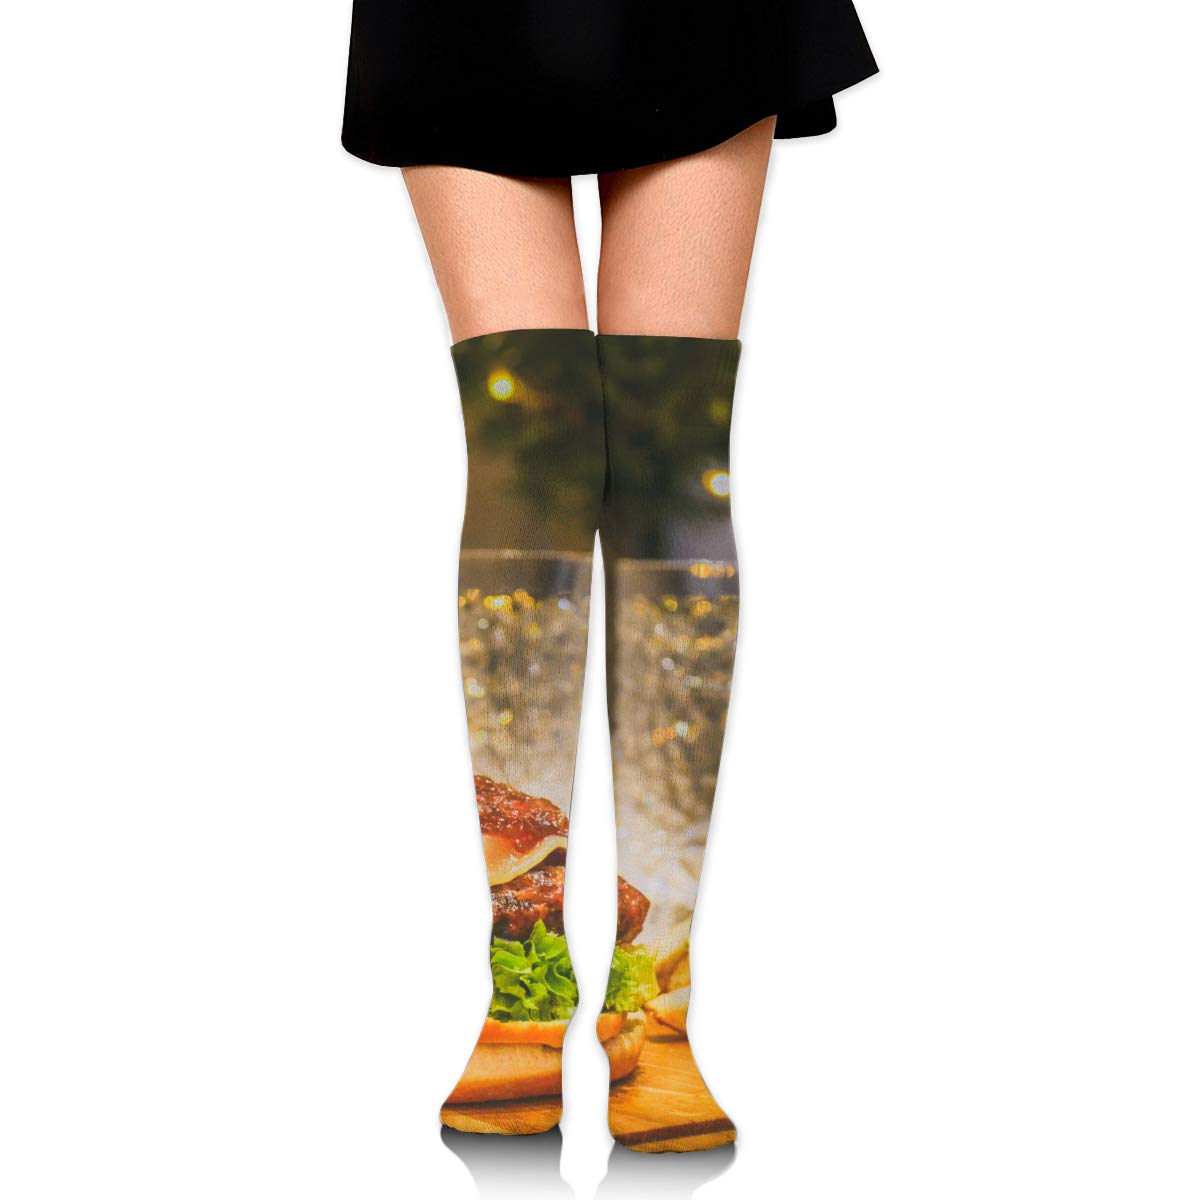 High Elasticity Girl Cotton Knee High Socks Uniform Cheeses Beef Hamburger And Fries Women Tube Socks